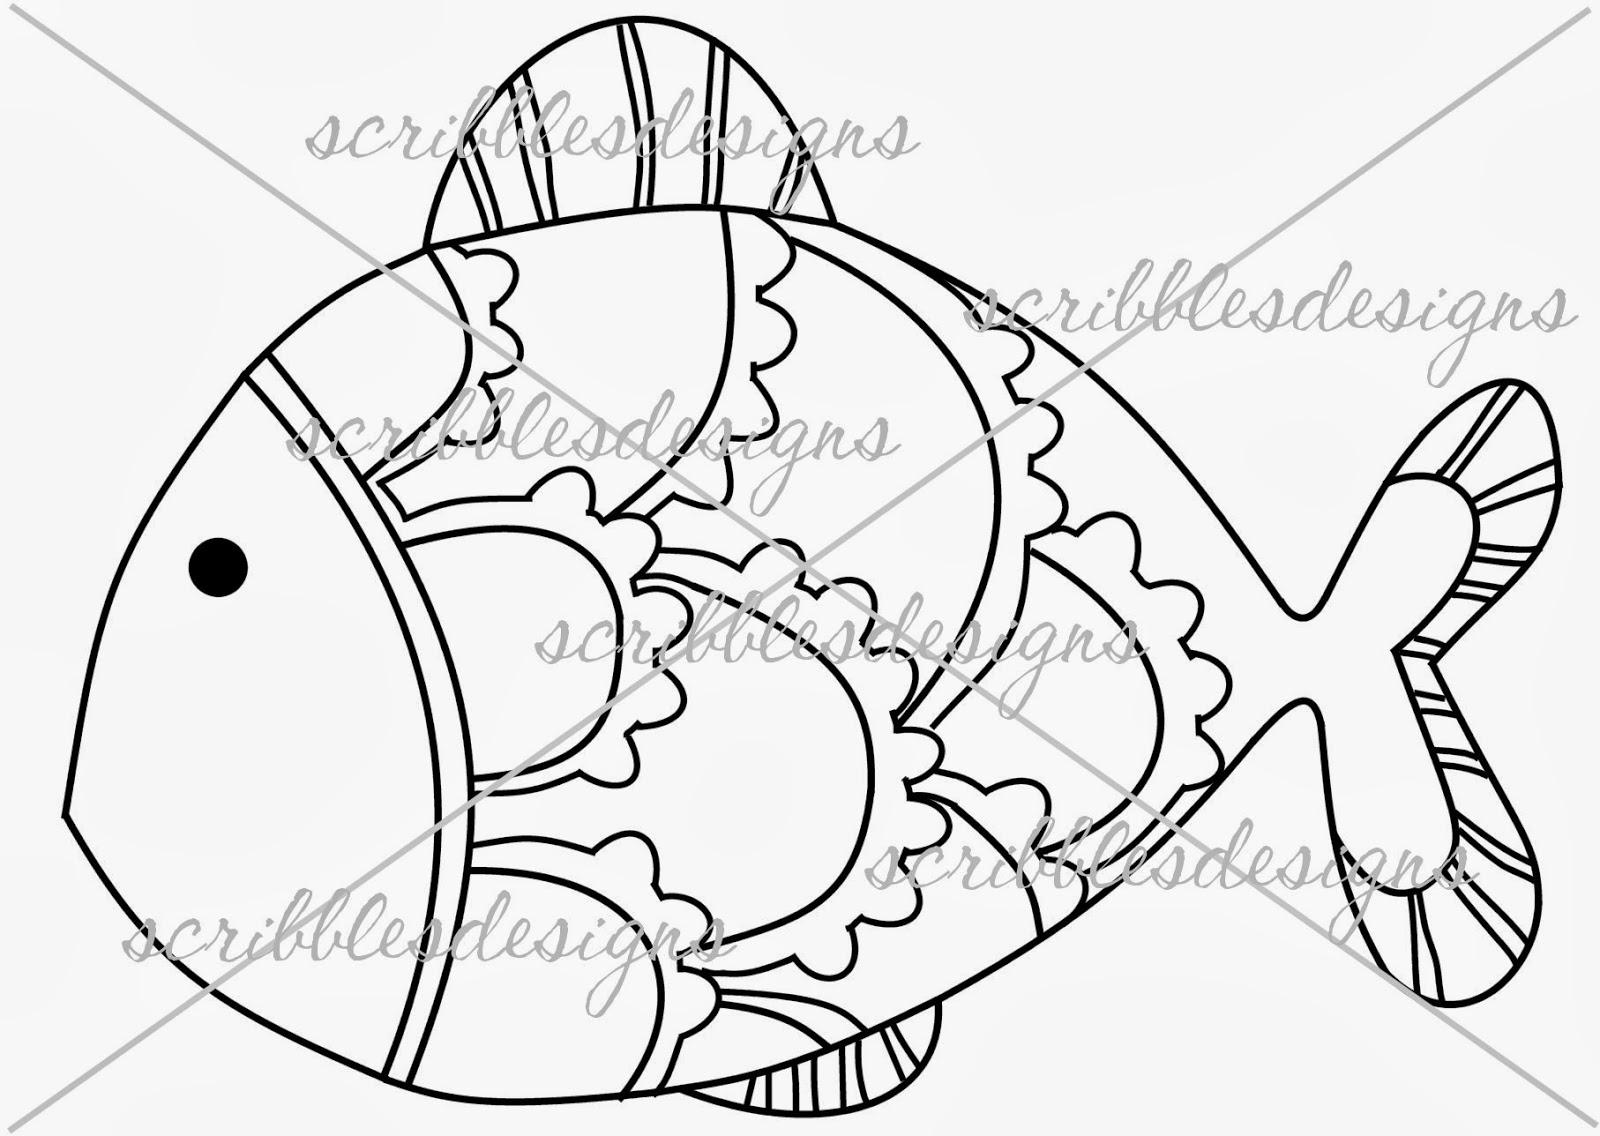 http://buyscribblesdesigns.blogspot.ca/2013/08/316-tropical-fish-5-200.html